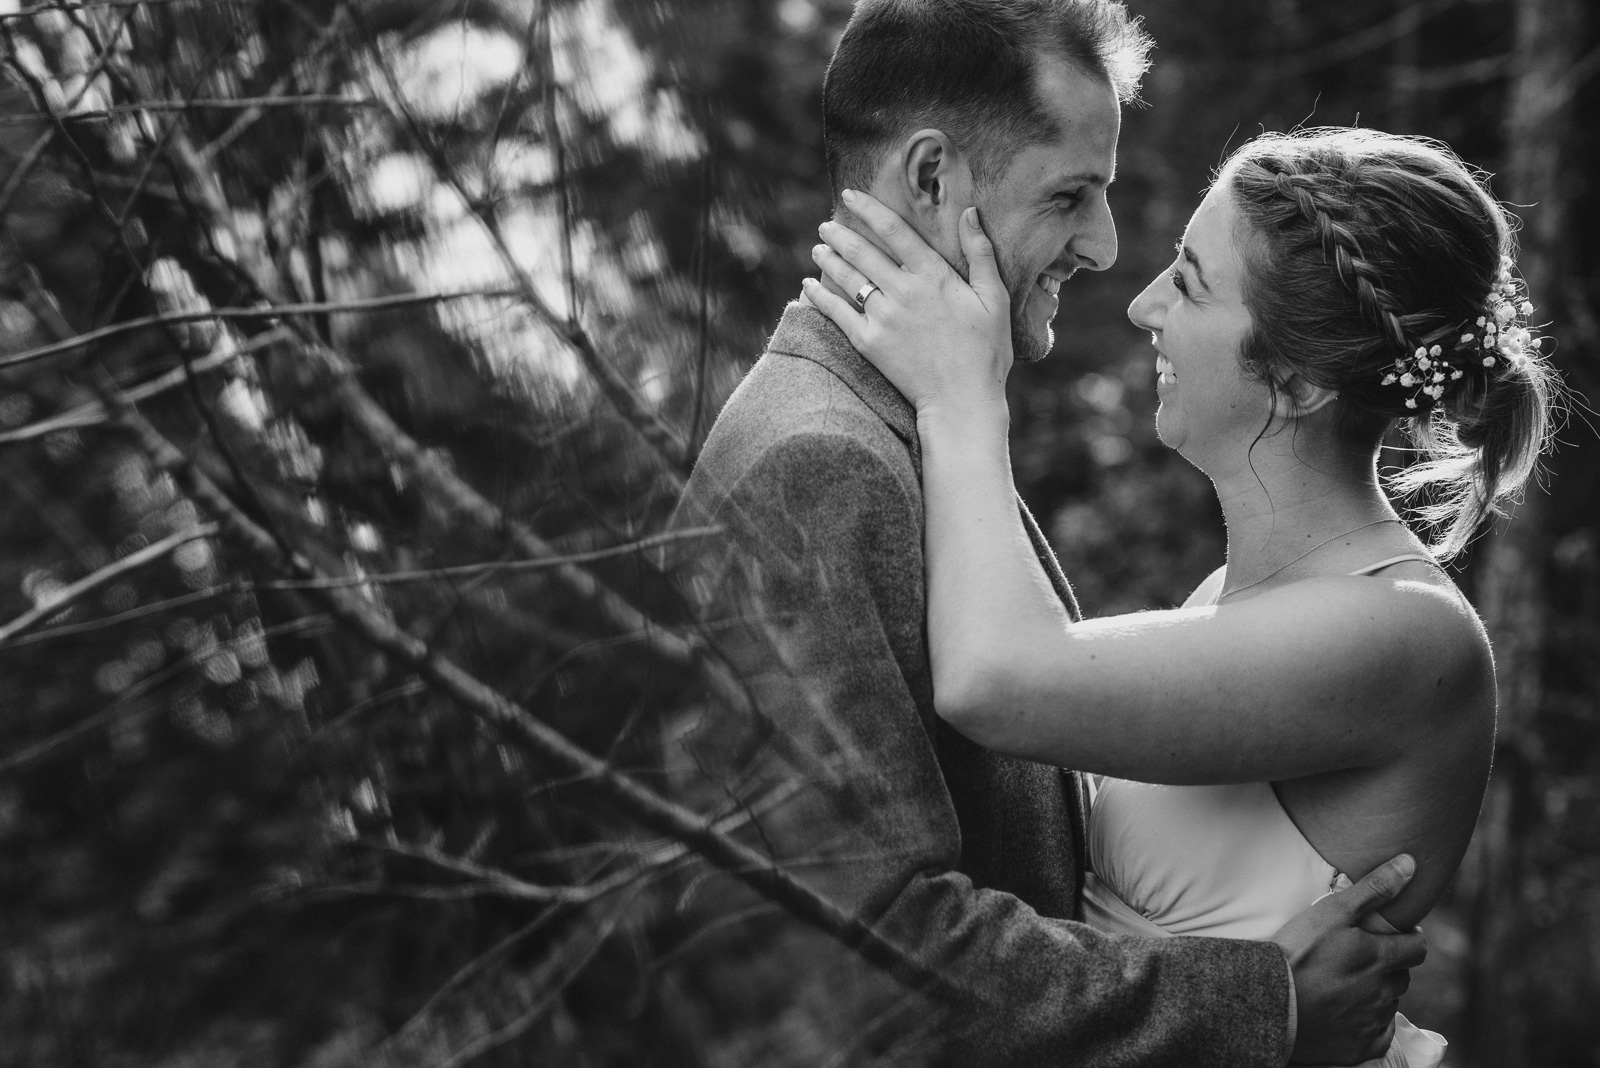 vancouver-island-wedding-photographers-cliff-gilker-park-smugglers-cove-elopement-29.jpg